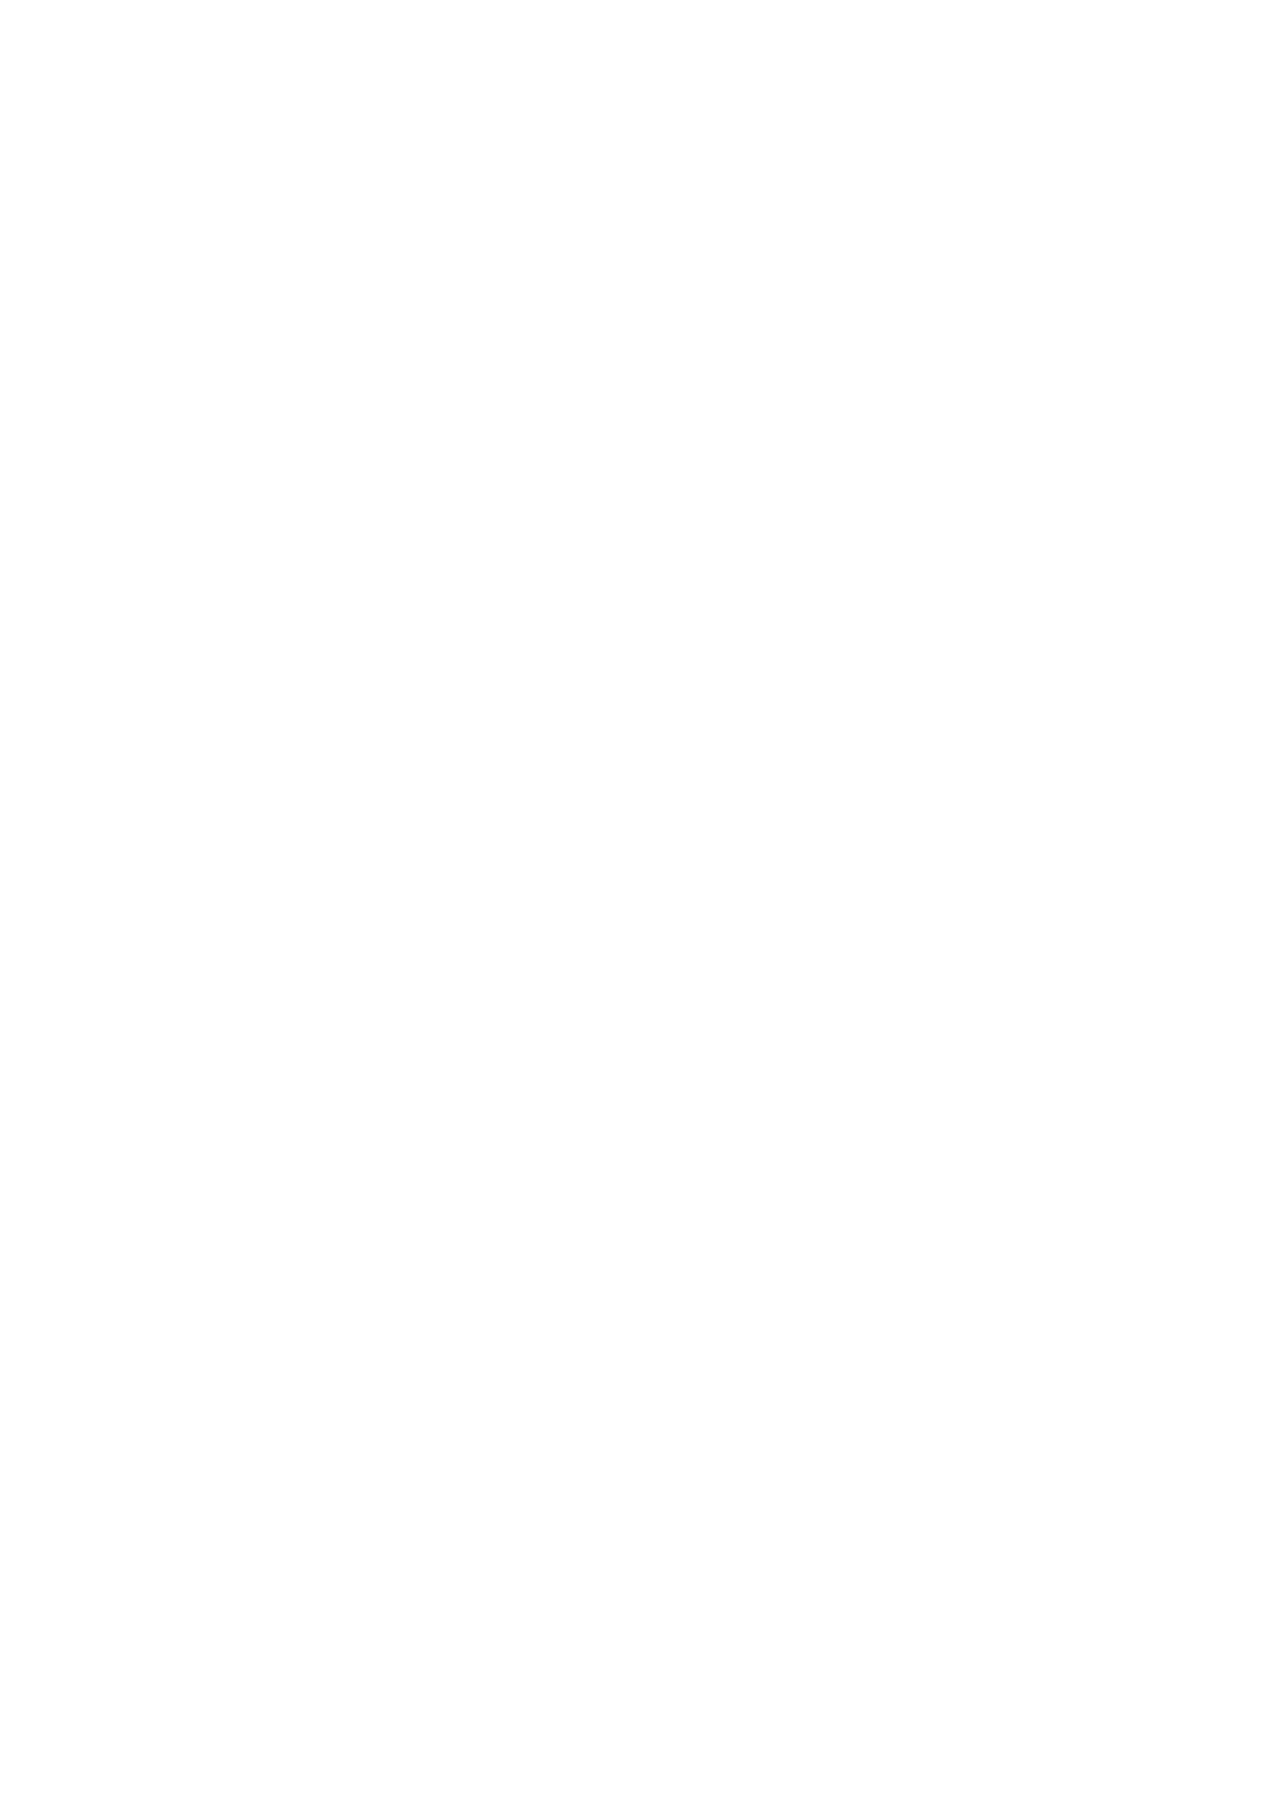 [AQUA SPACE (Asuka)] Kiriko-chan to Asobou! | Let's play with Kiriko-chan! (Sword Art Online) [English] [EHCOVE] [Digital] 26